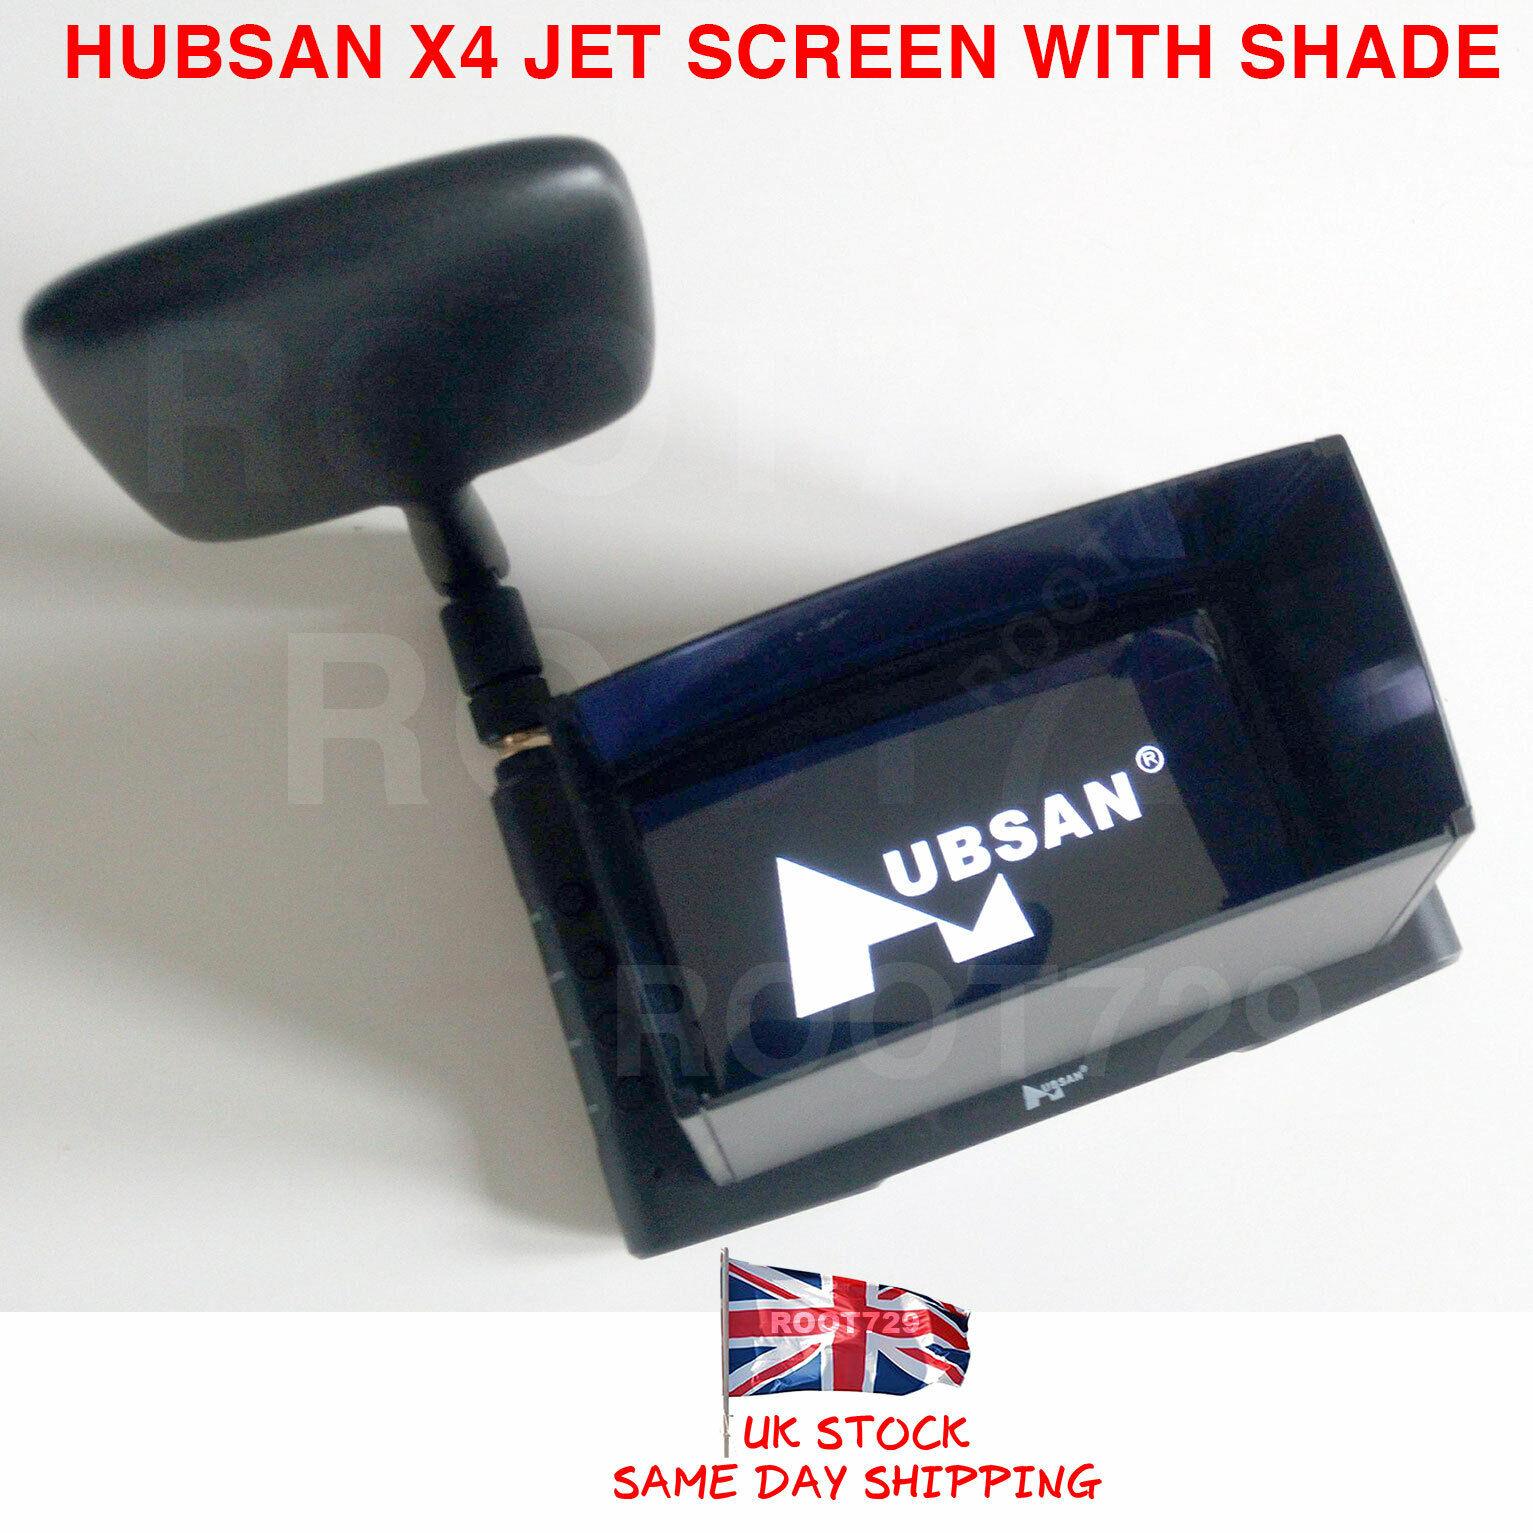 Genuine Hubsan H123 X4 Jet HS001 Pantalla con sunshield Cubierta H123D-16 Reino Unido Stock